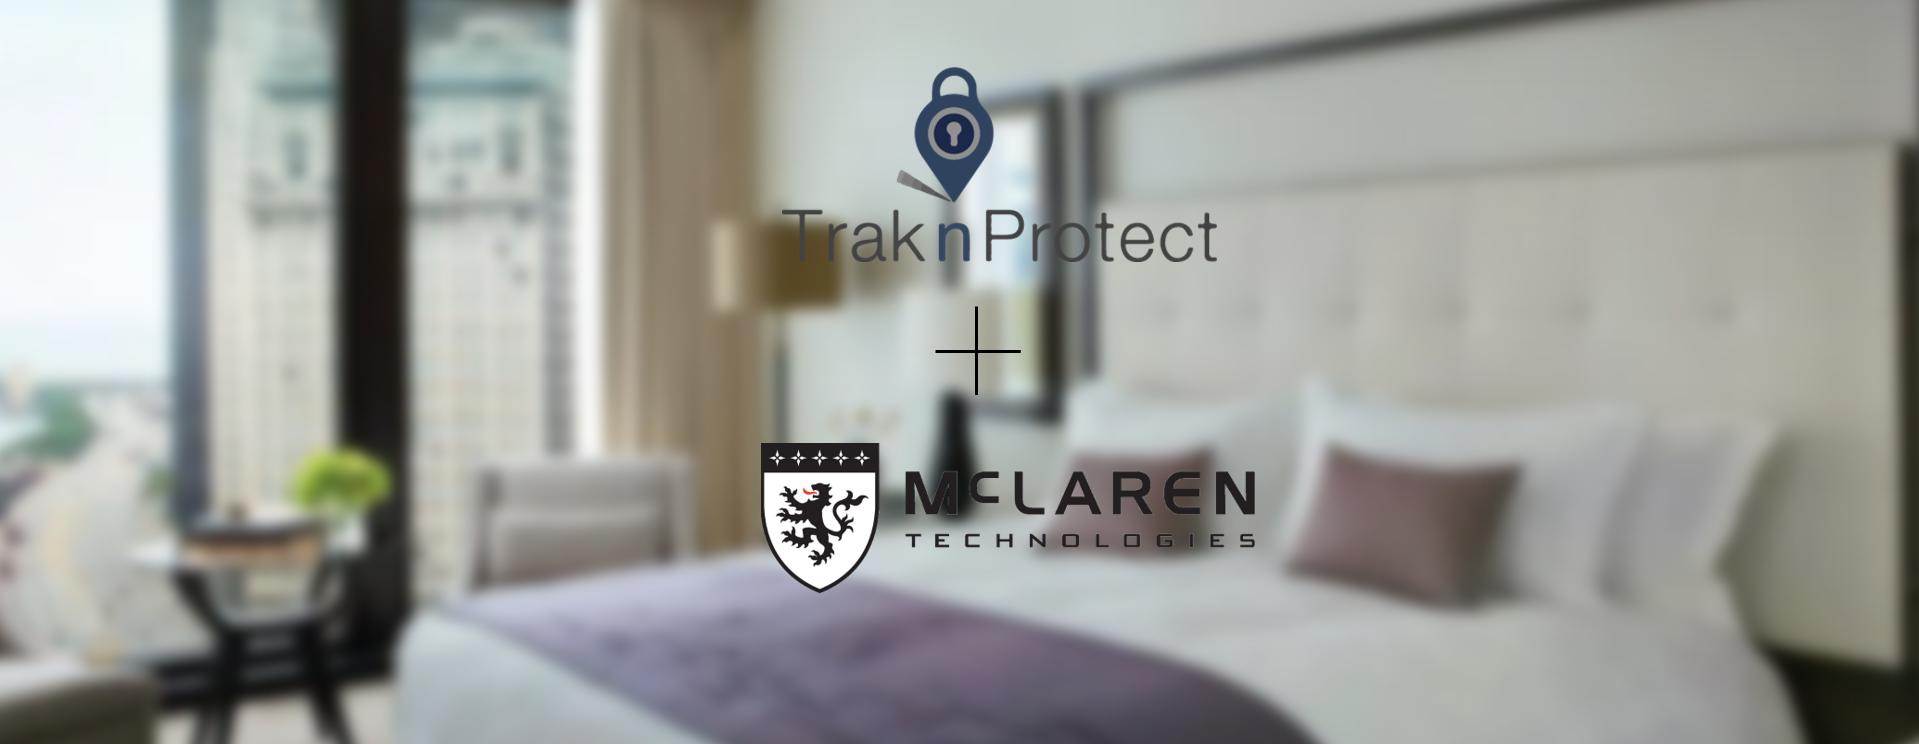 McLaren and TraknProtect